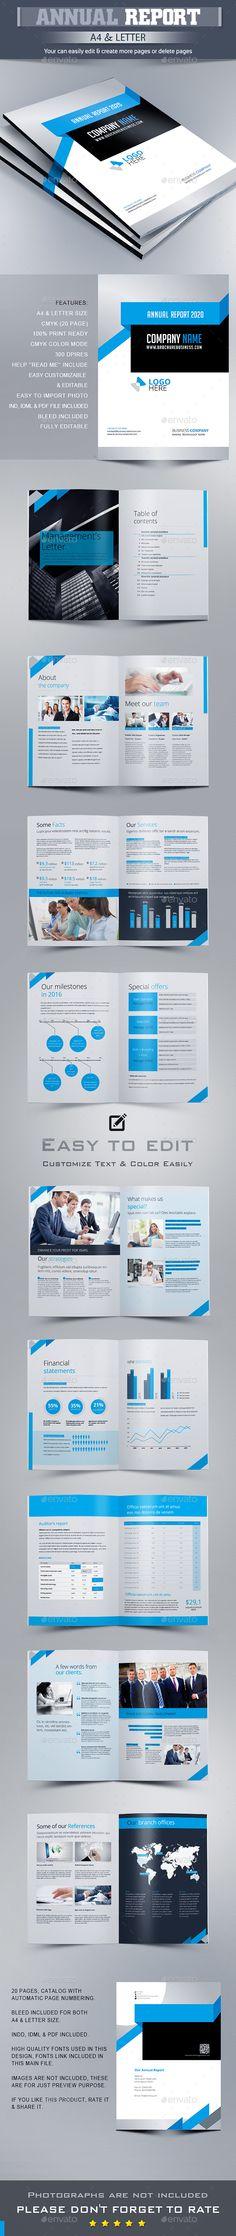 Company Portfolio Brochure Indd 2016 Brochures, Brochure - annual report templates free download